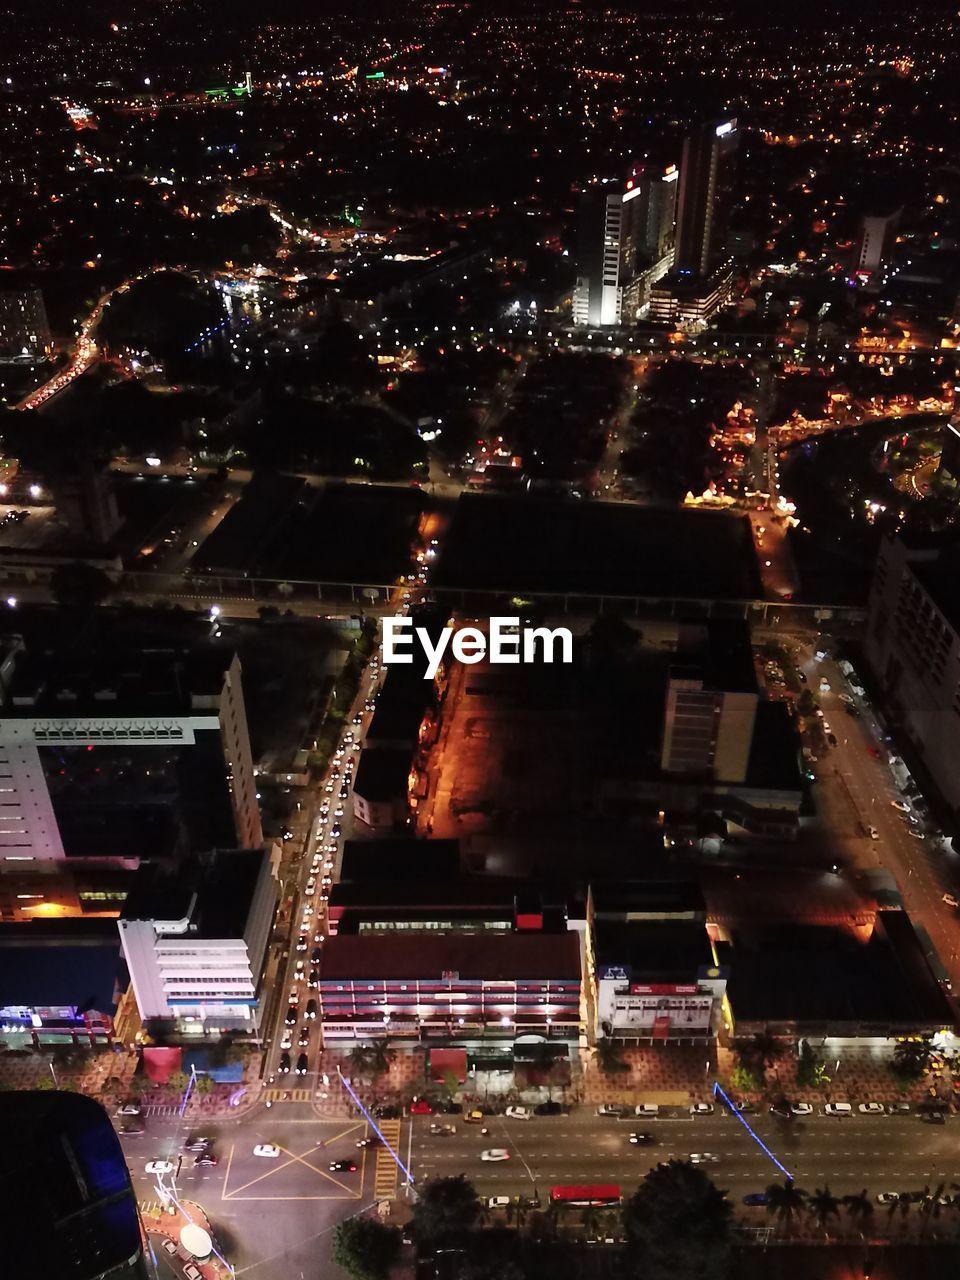 AERIAL VIEW OF ILLUMINATED CITY